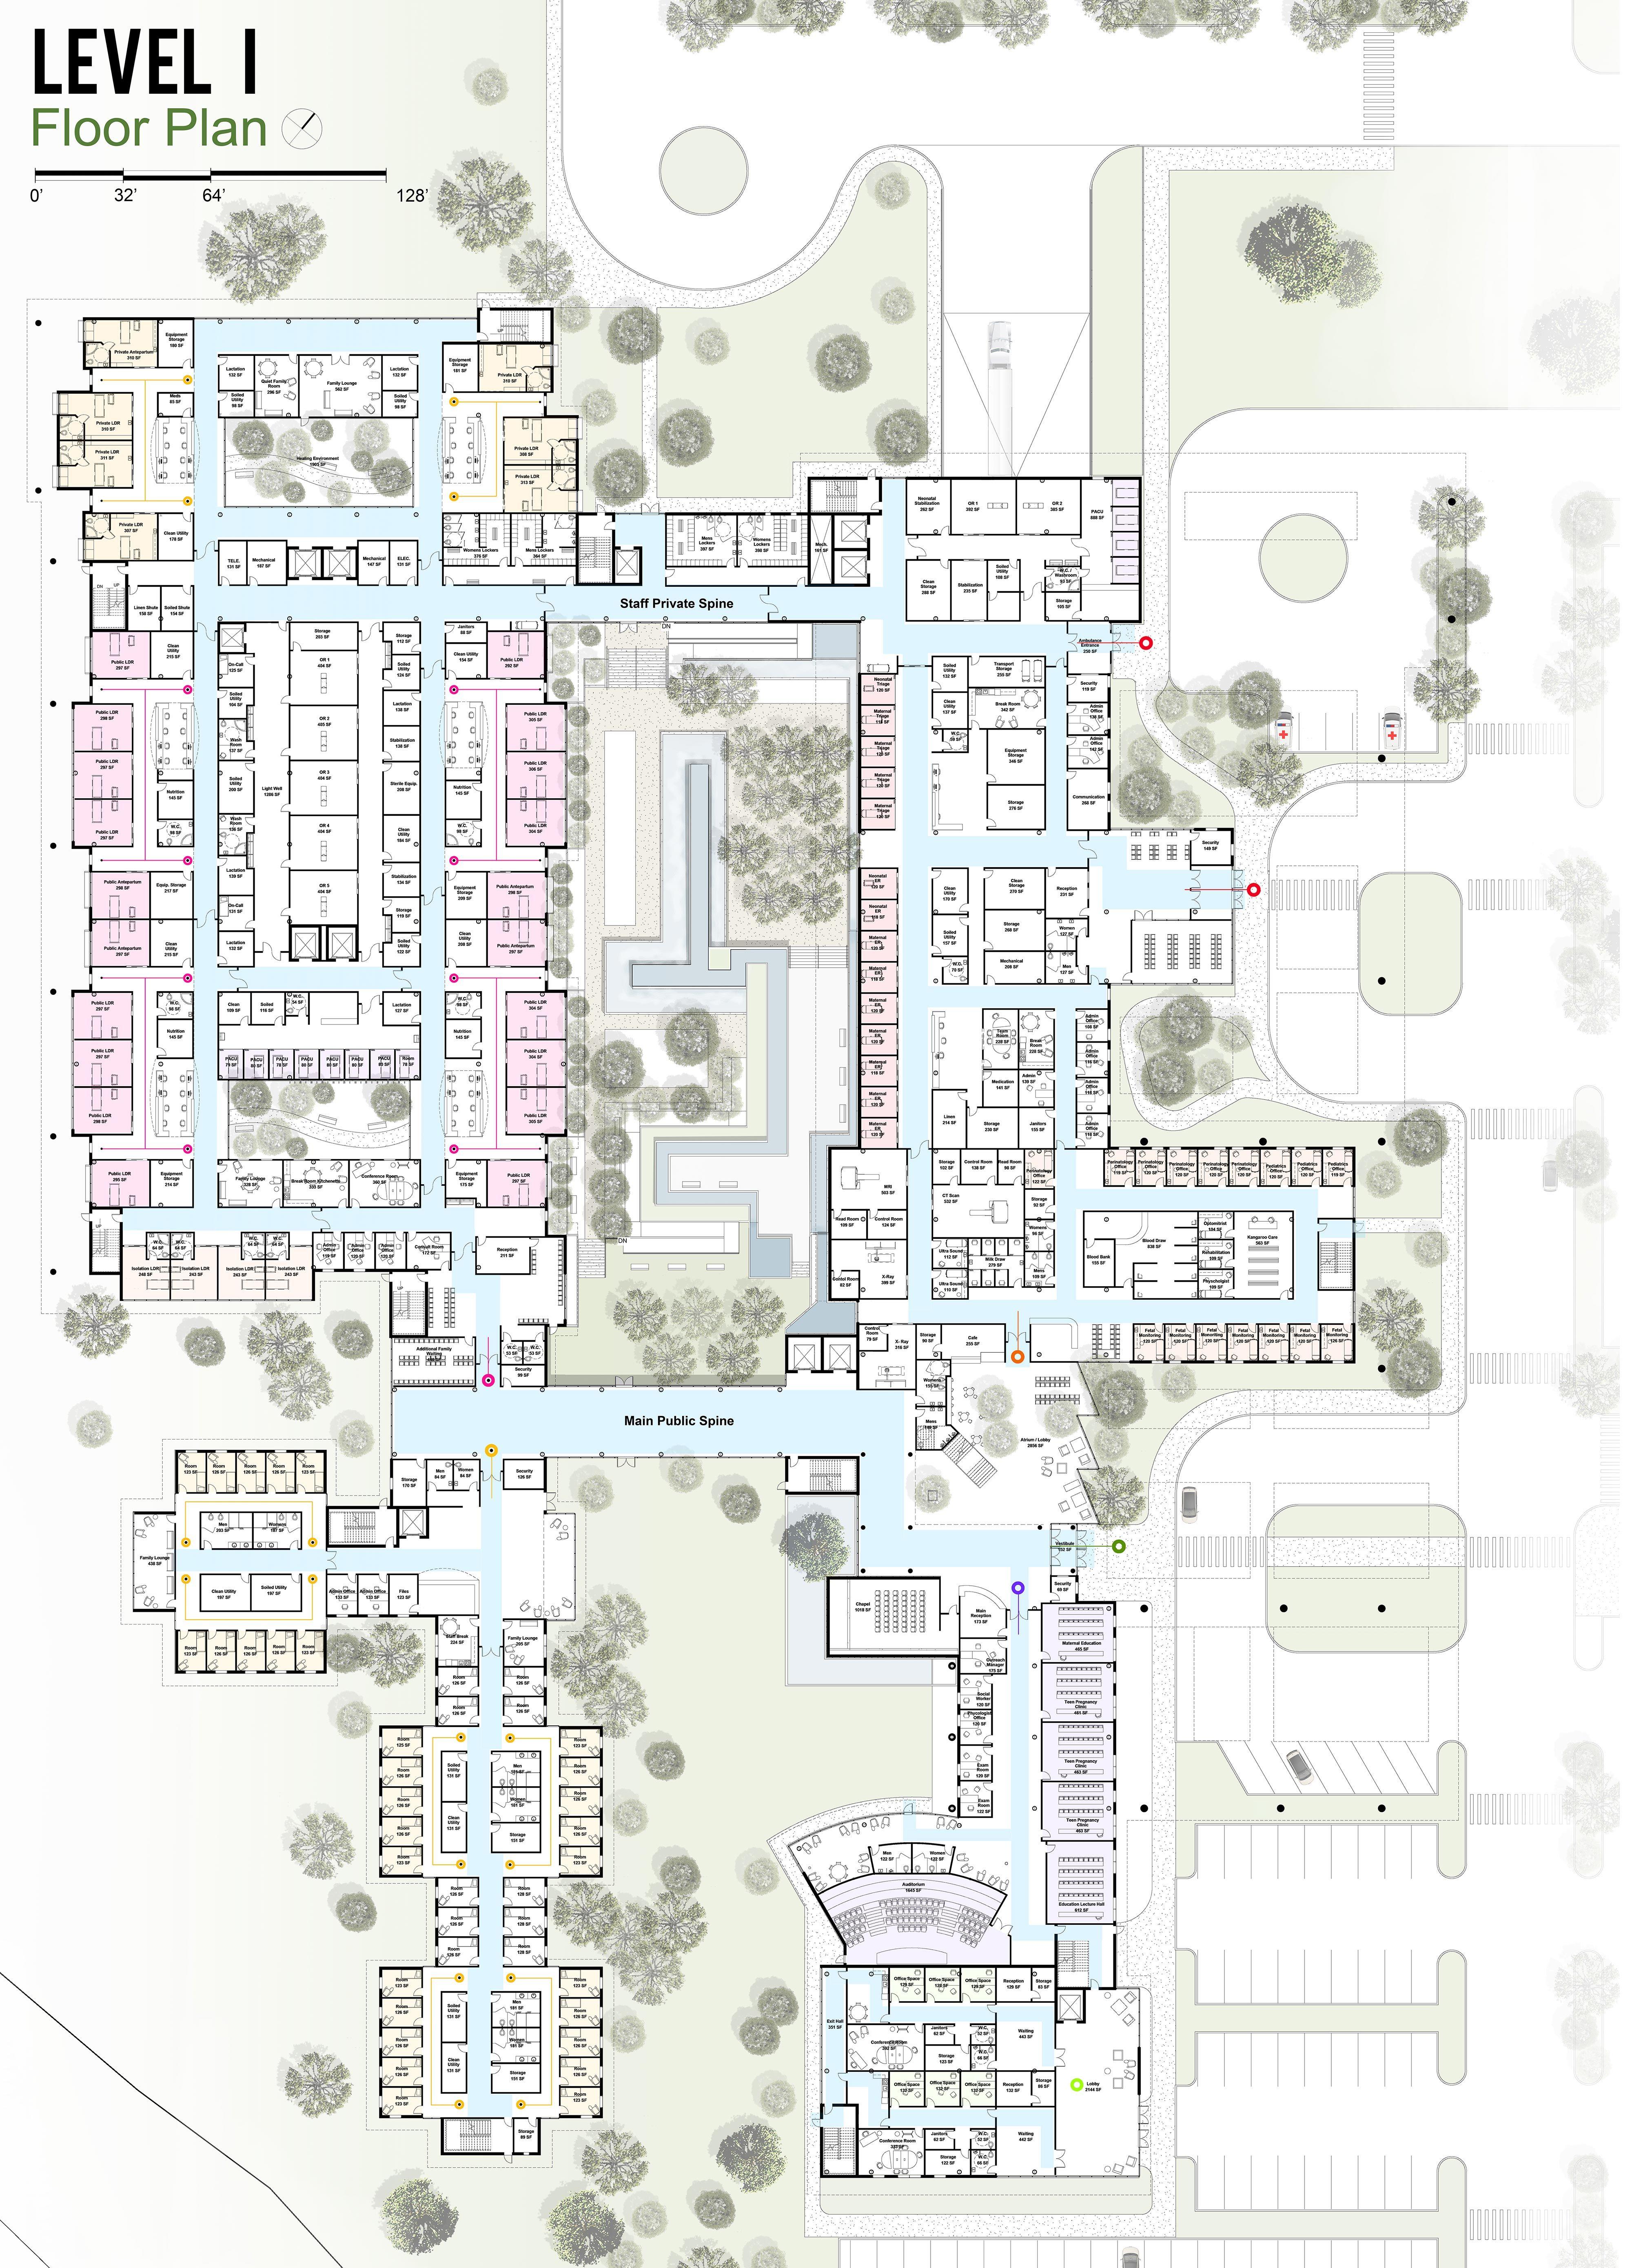 Architectural Floor Plans Architecture Floor Plans  : 5b3bd5c3a14d354a0262eb91961c7d07 from 165.227.82.154 size 4000 x 5558 jpeg 2668kB